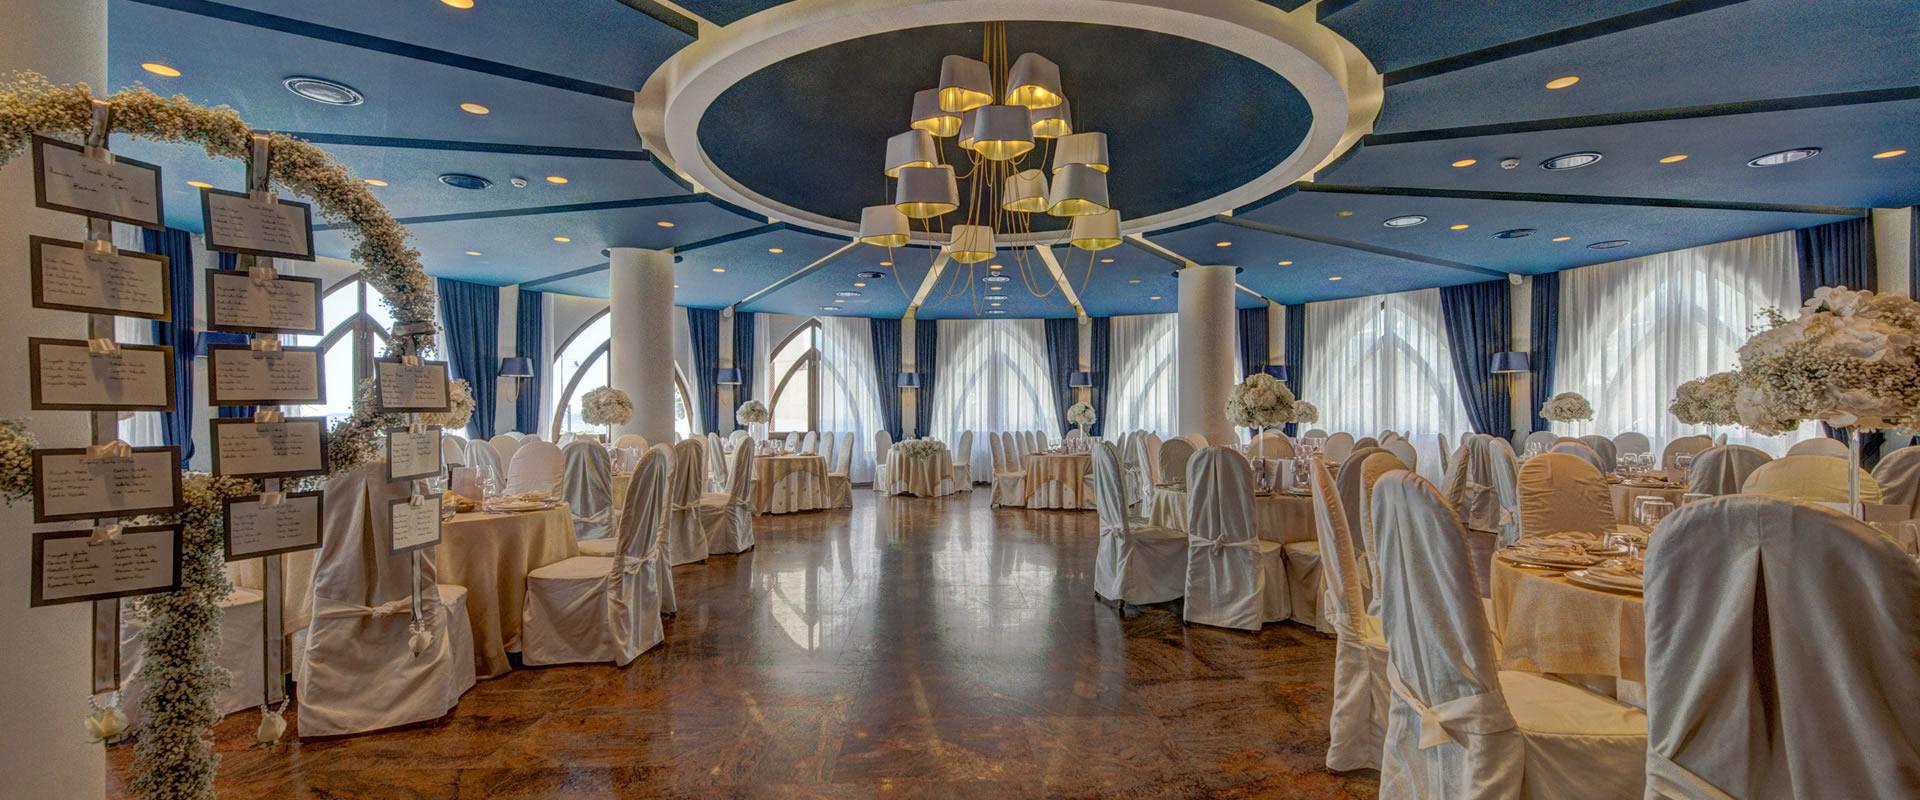 Hotel Bajamar Aqua Interno